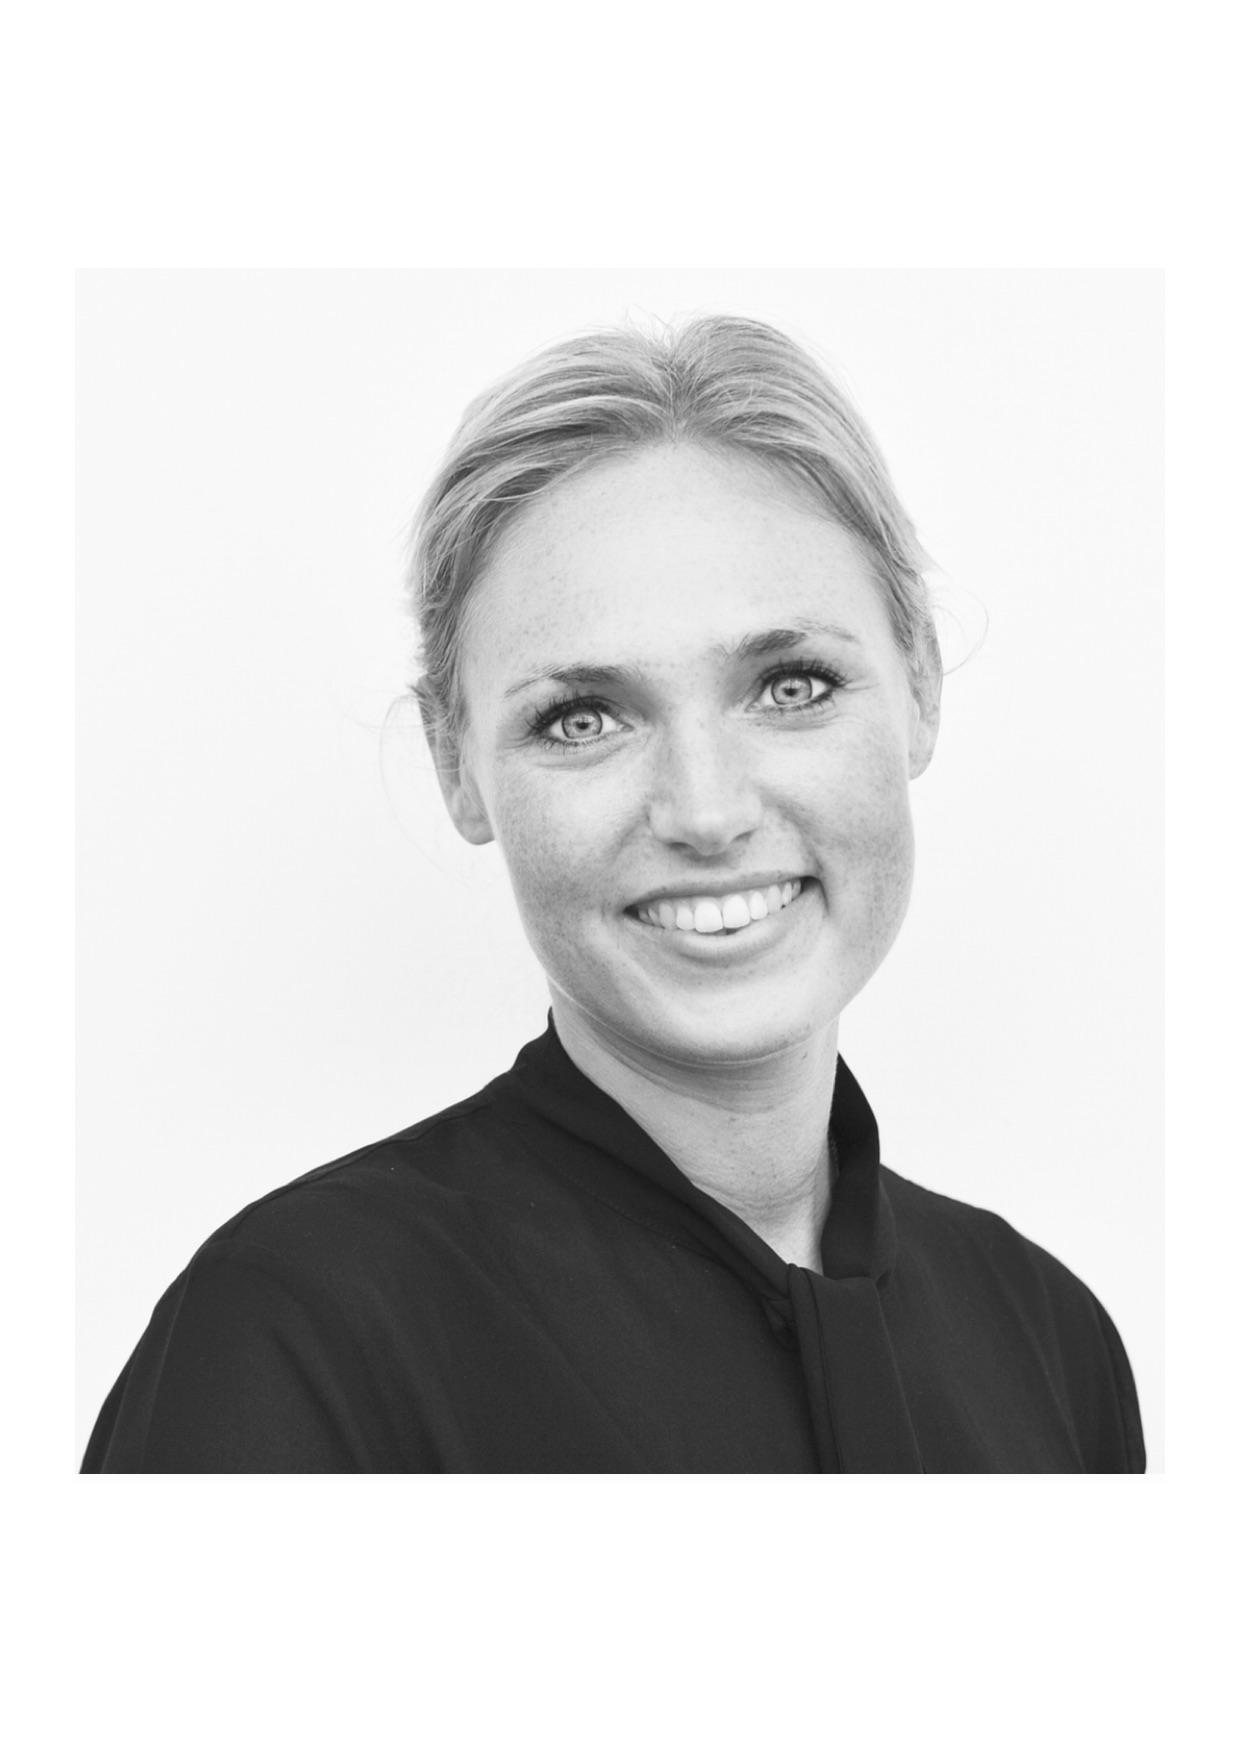 Sissel Mai Ødegaard